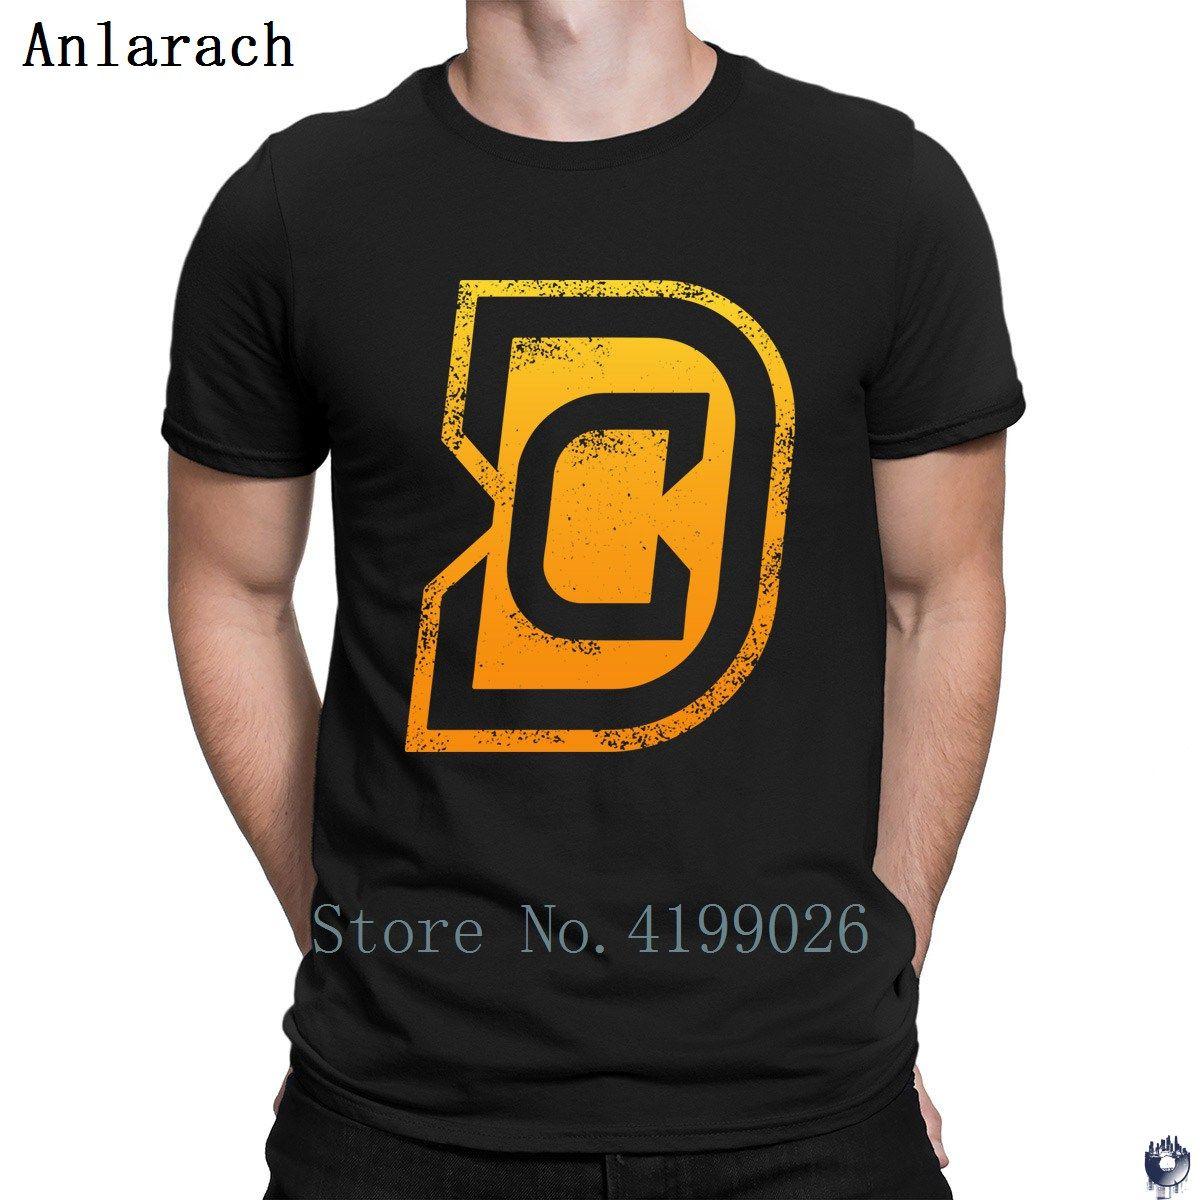 Dc Tshirt Summer Top Round Neck Design Homme Mens Tshirt Classical